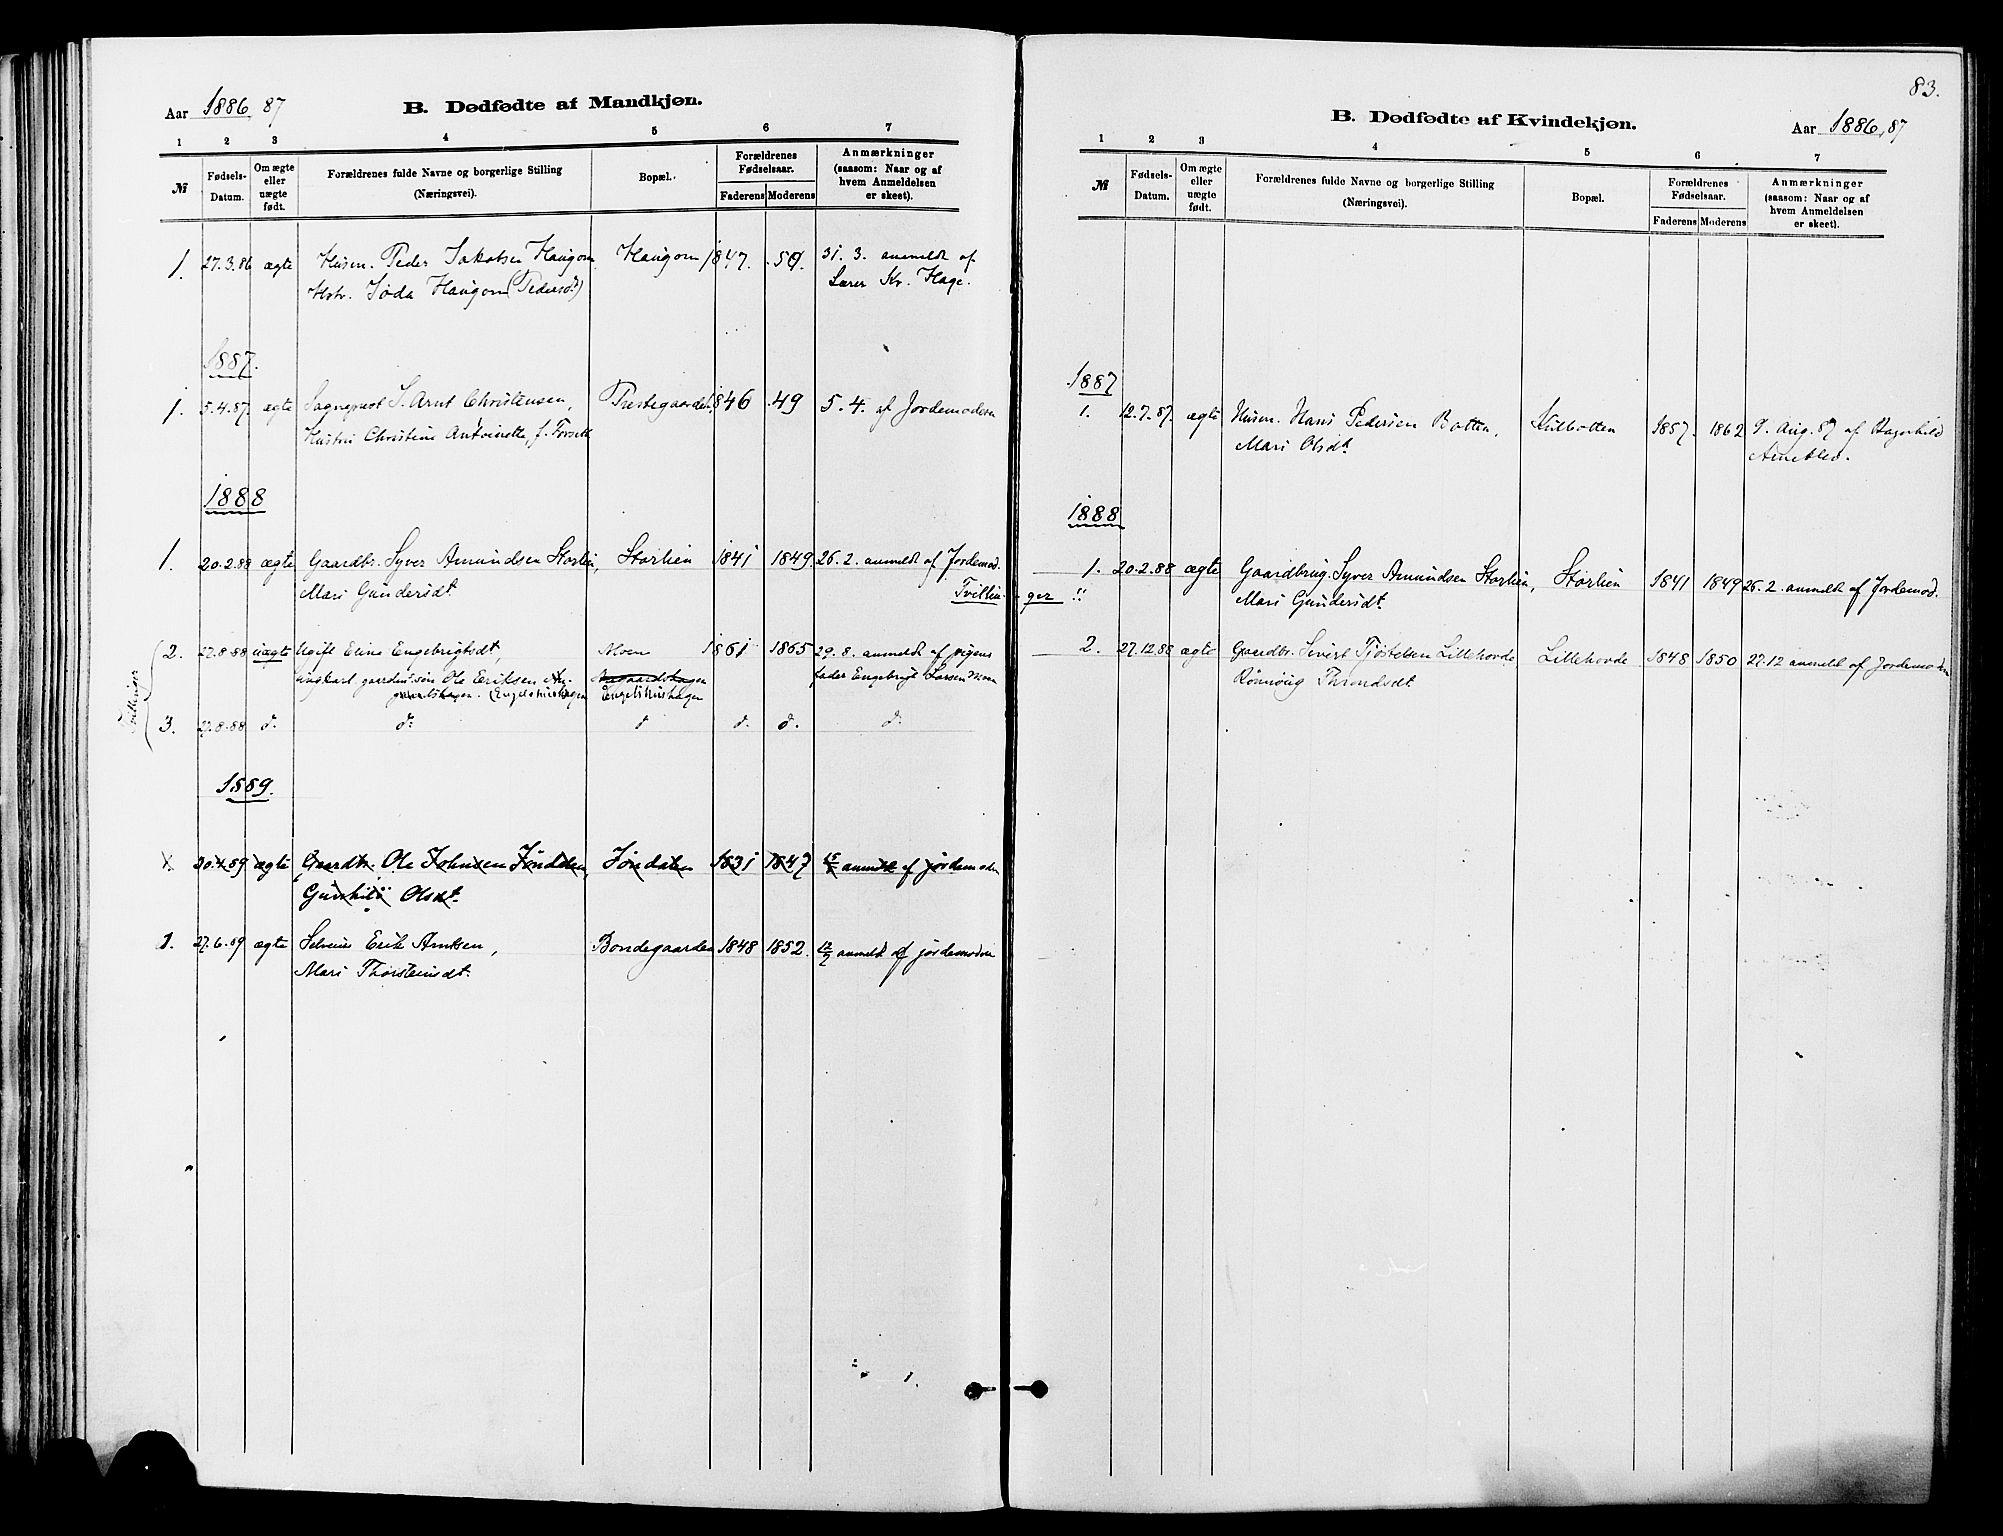 SAH, Dovre prestekontor, Ministerialbok nr. 2, 1879-1890, s. 83